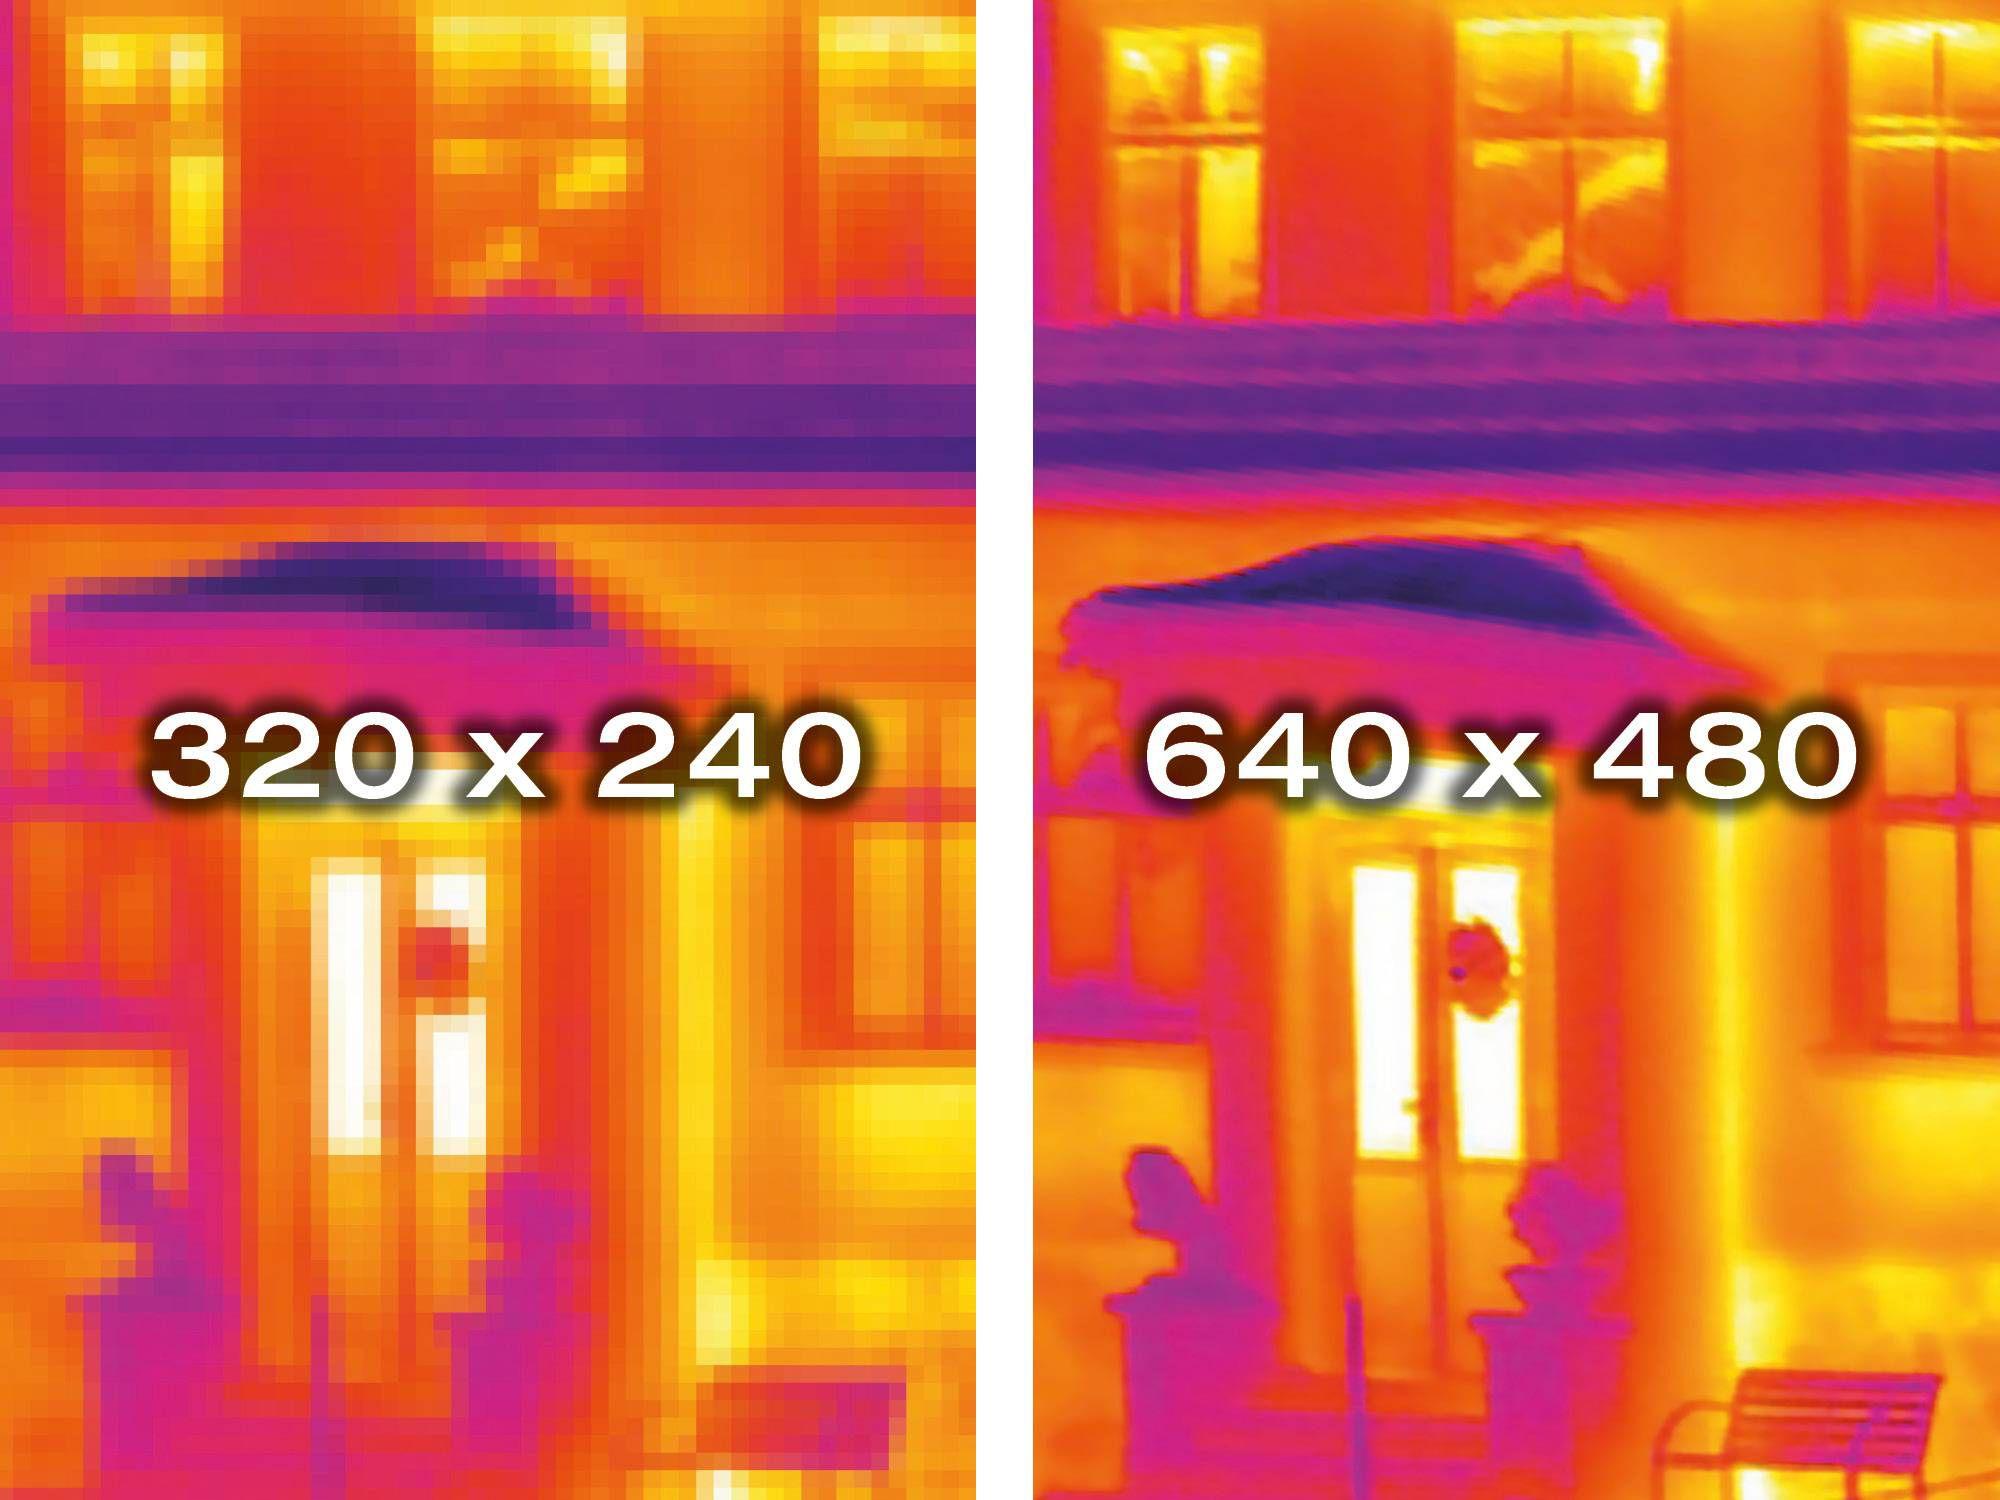 testo 883 红外热像仪红外分辨率为320x240像素,利用内置的testo SuperResolution红外超像素技术,甚至可以扩展至640x480像素。